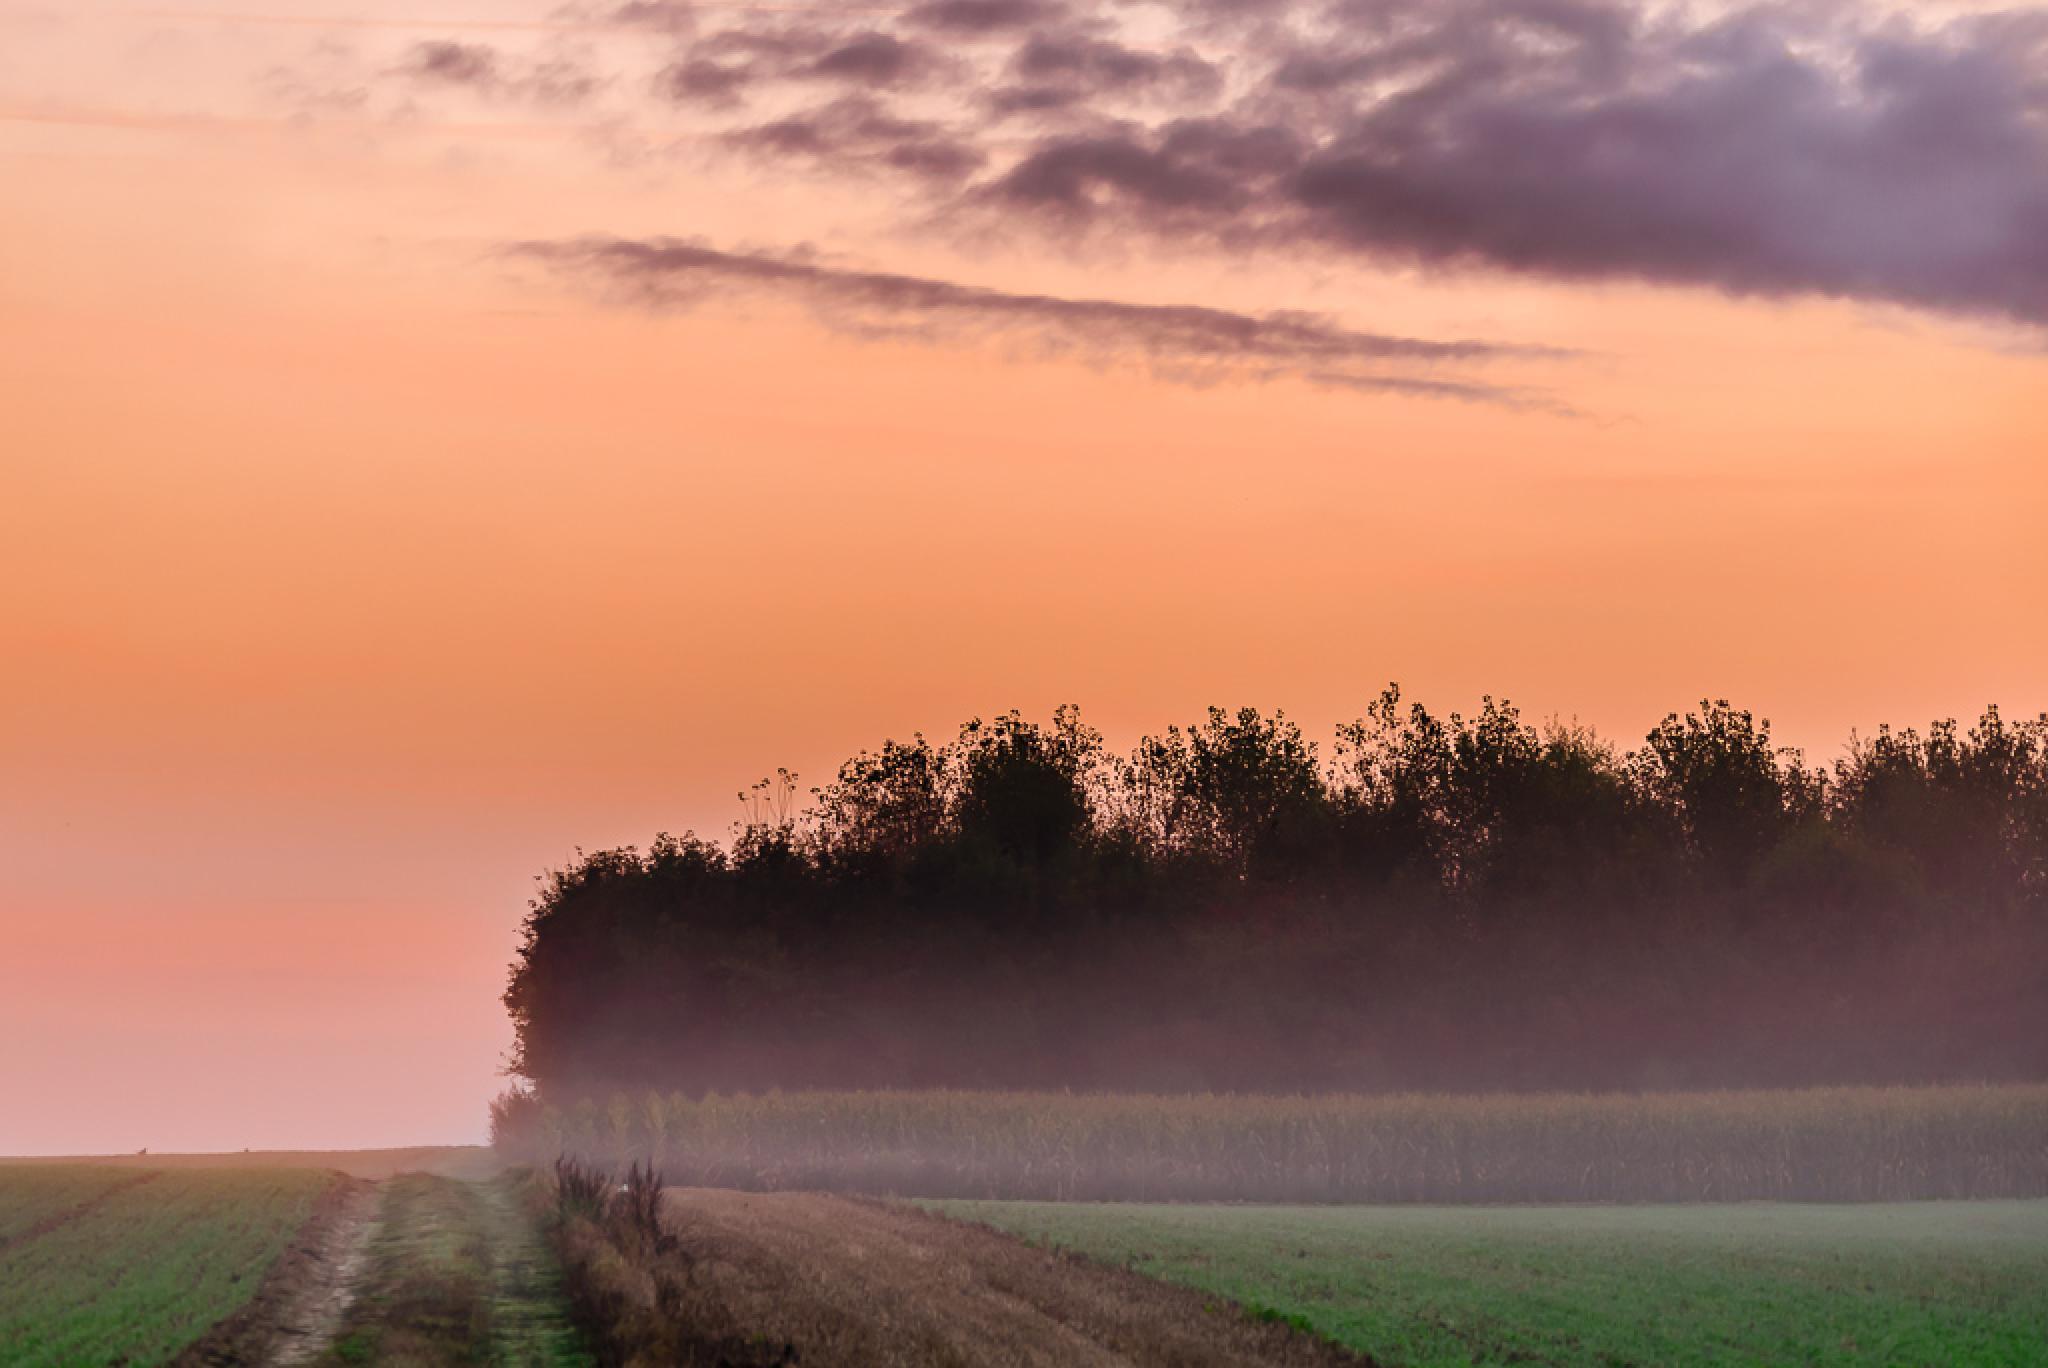 Mist on the countryside by Frédéric Masure